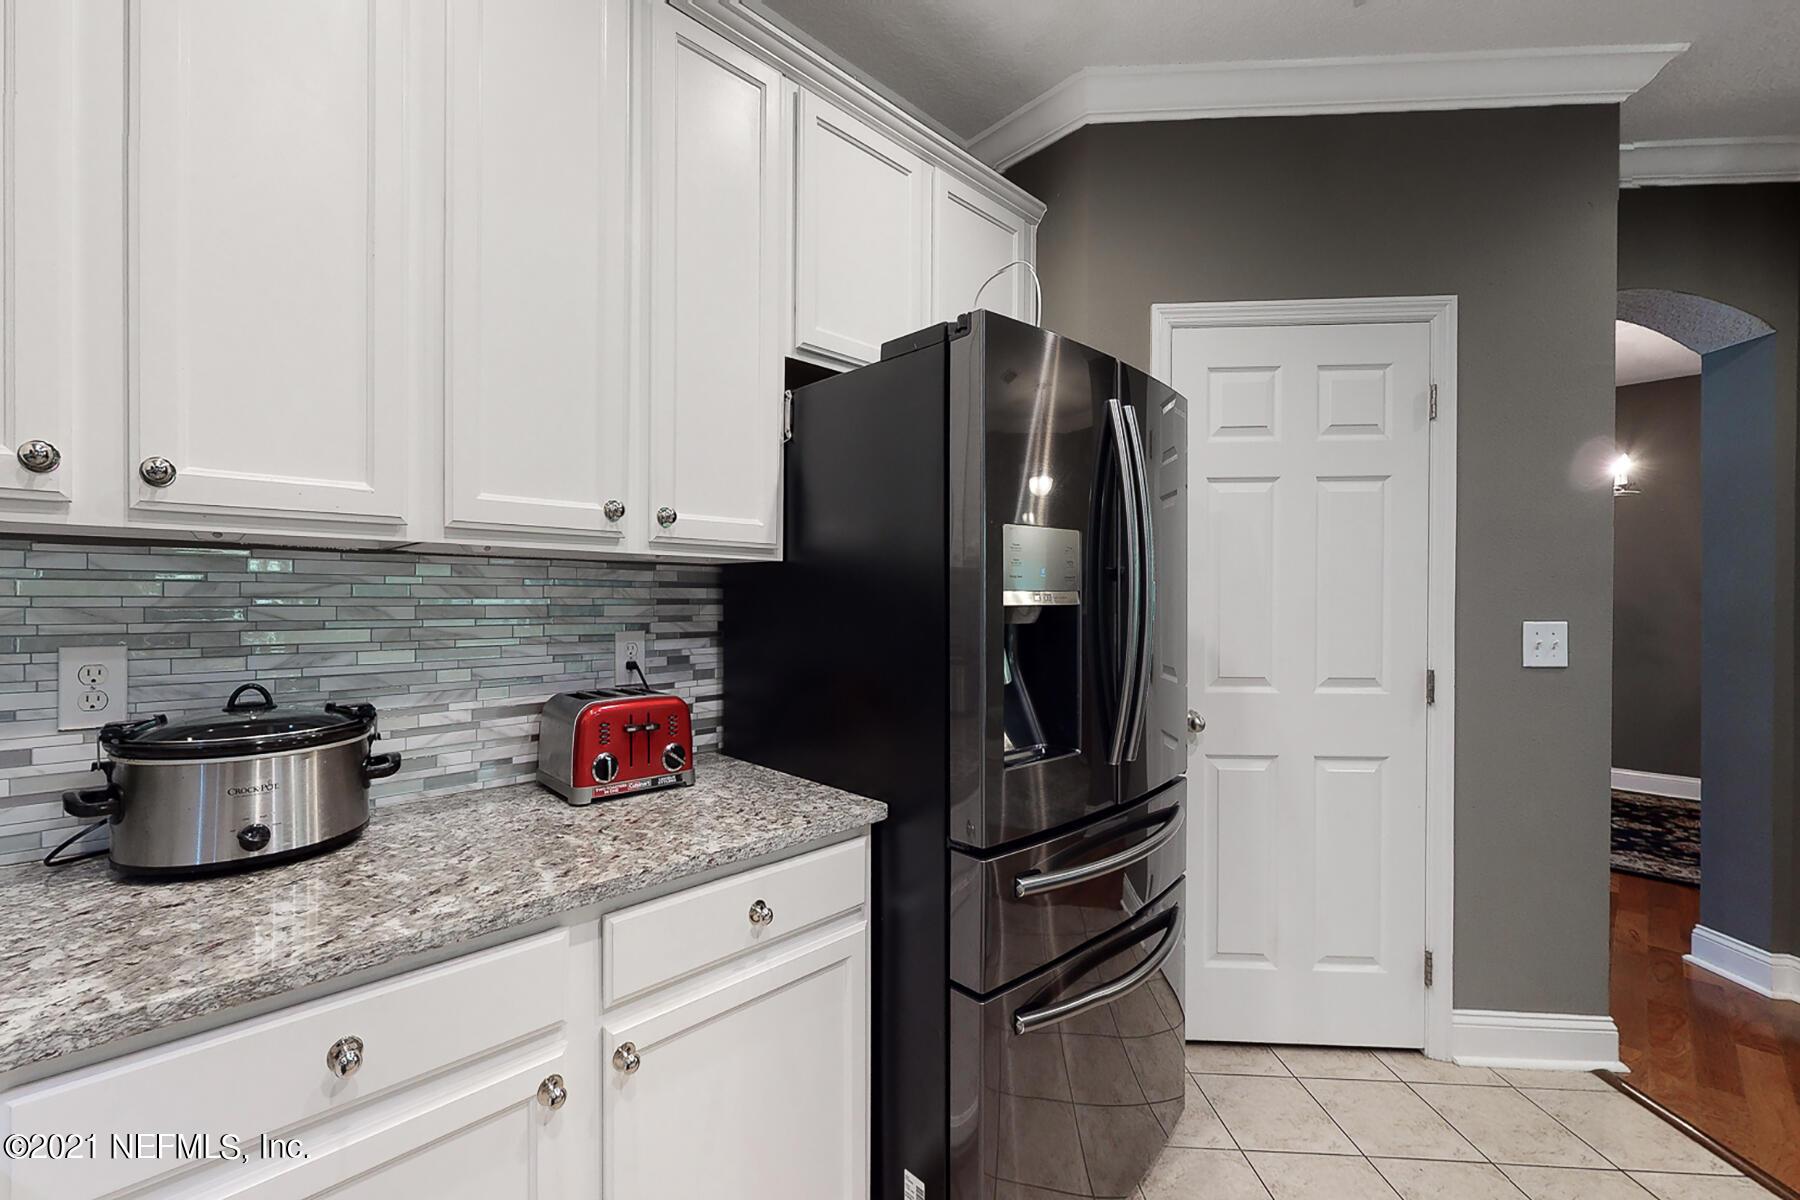 3252 CHESTNUT RIDGE, ORANGE PARK, FLORIDA 32065, 3 Bedrooms Bedrooms, ,2 BathroomsBathrooms,Residential,For sale,CHESTNUT RIDGE,1135933